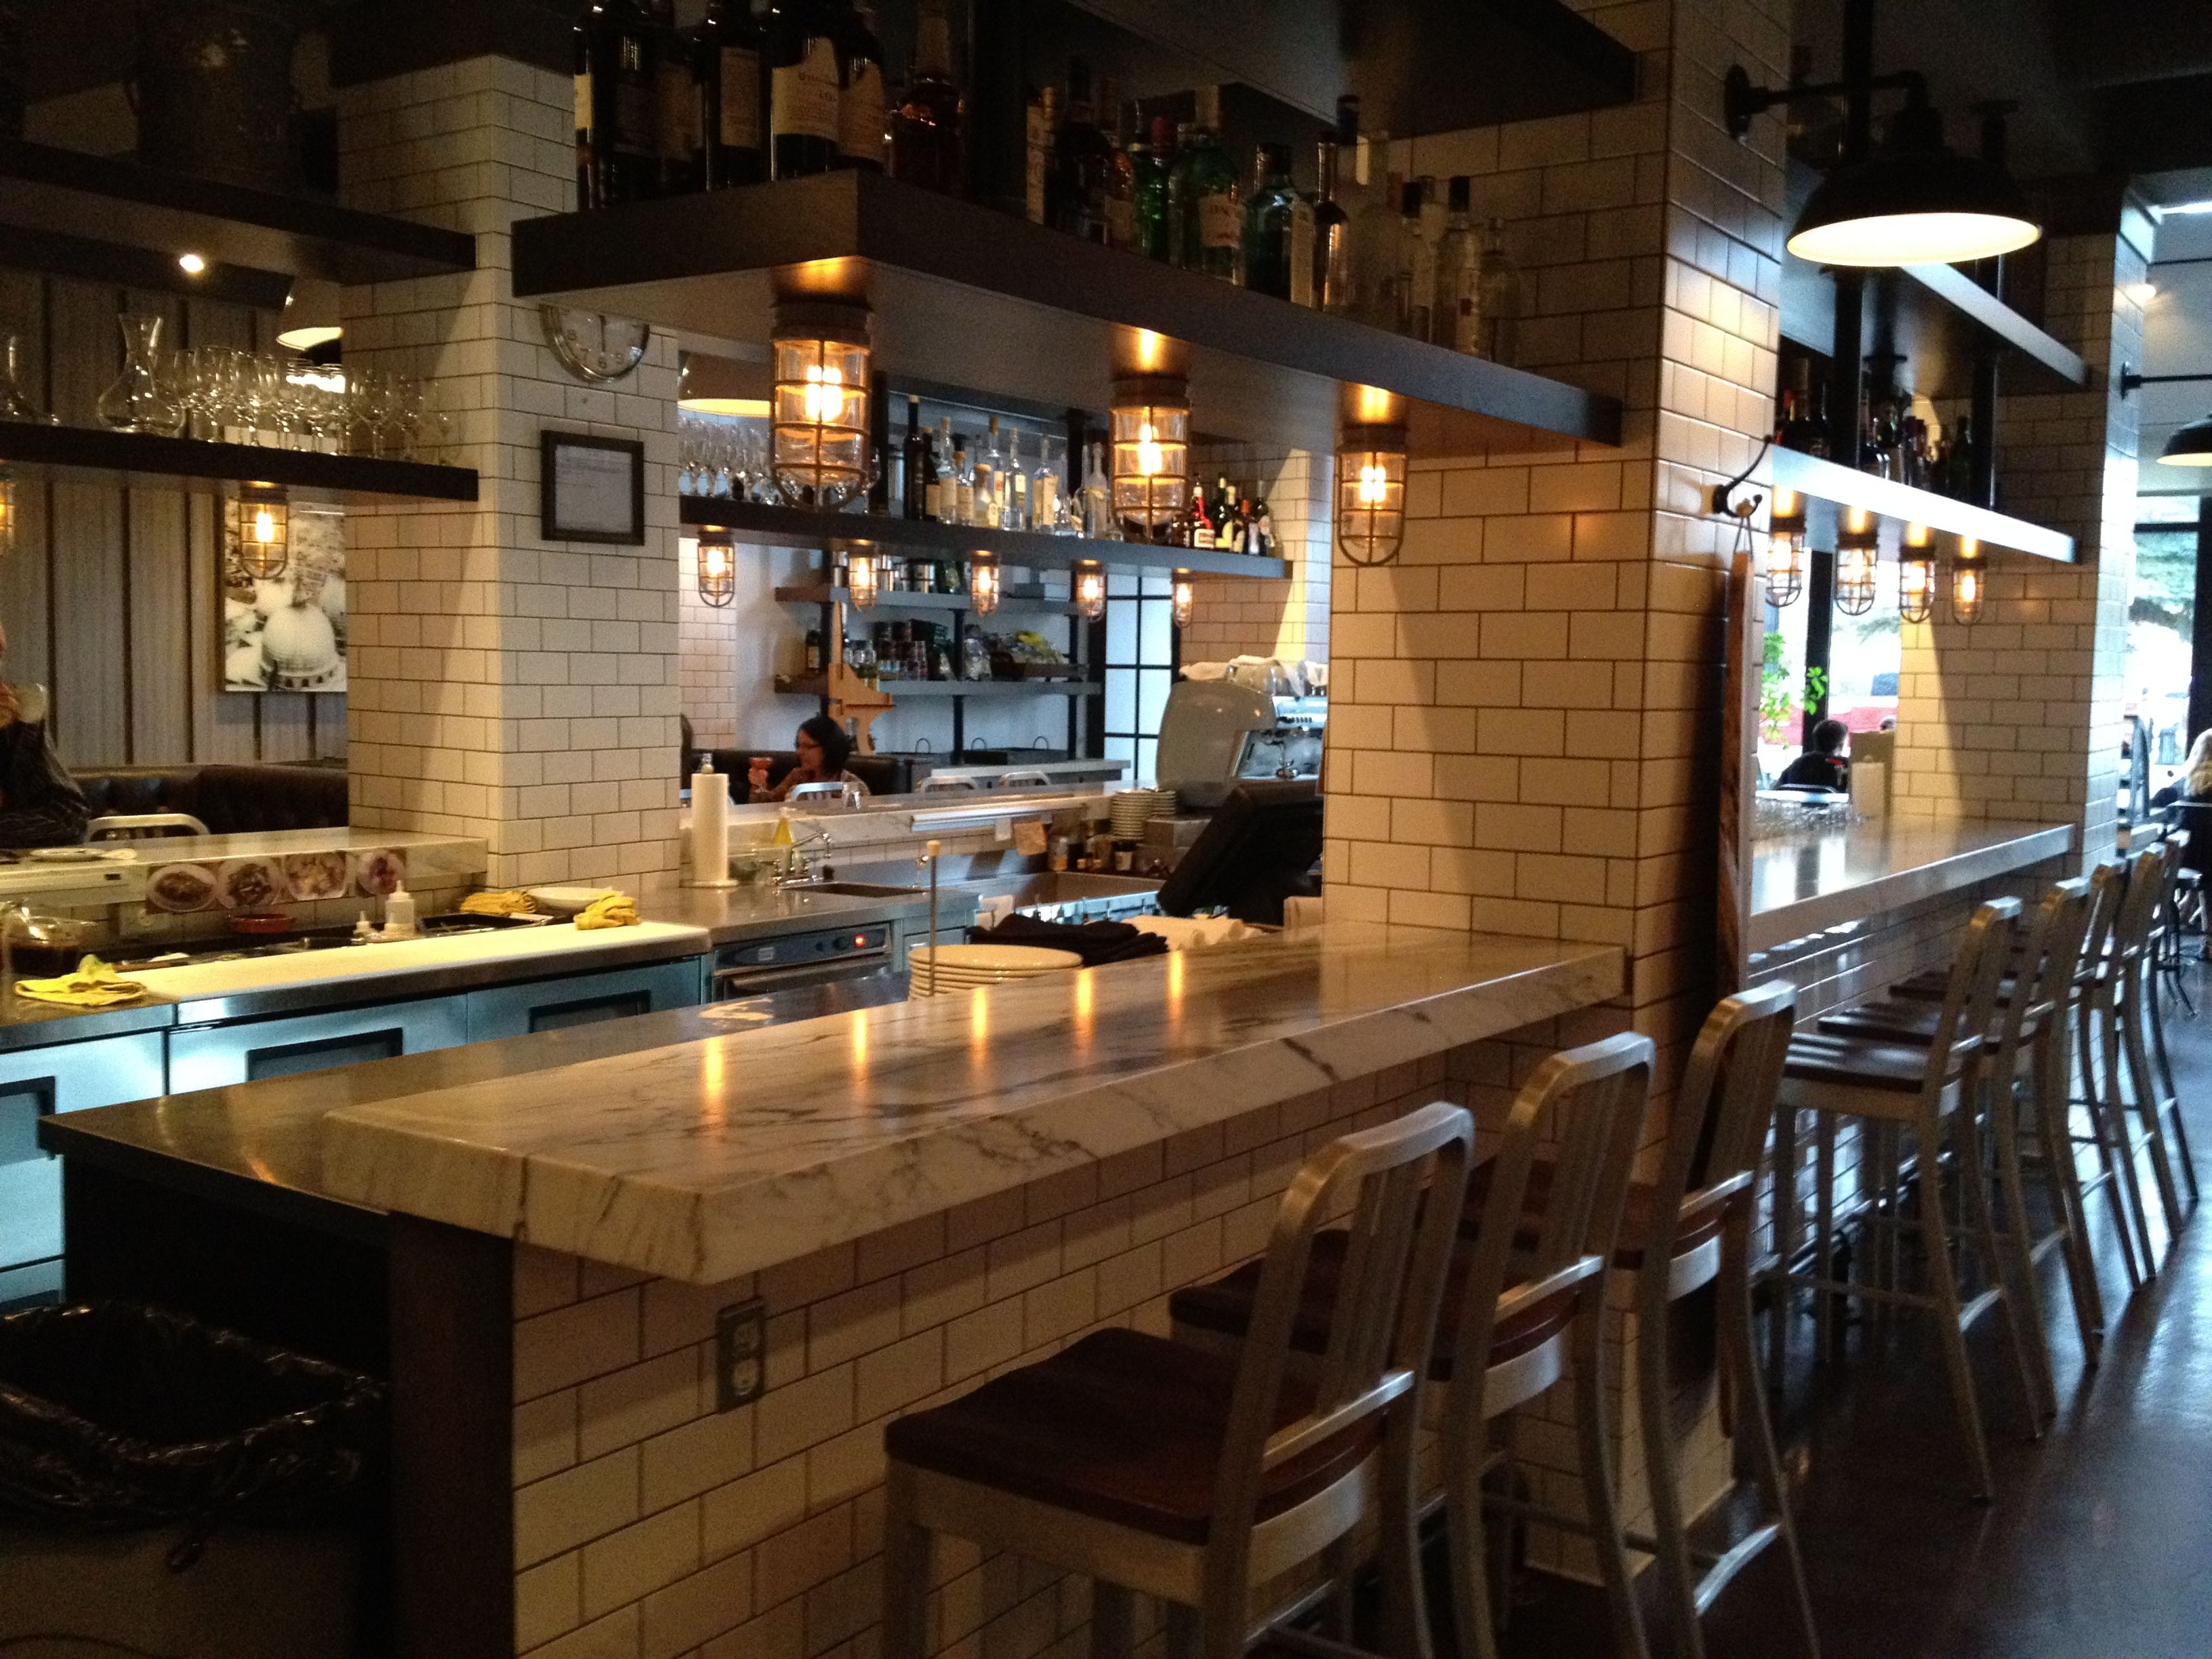 hills onyx beverly bar oaks restaurant thousand countertops corner angeles los